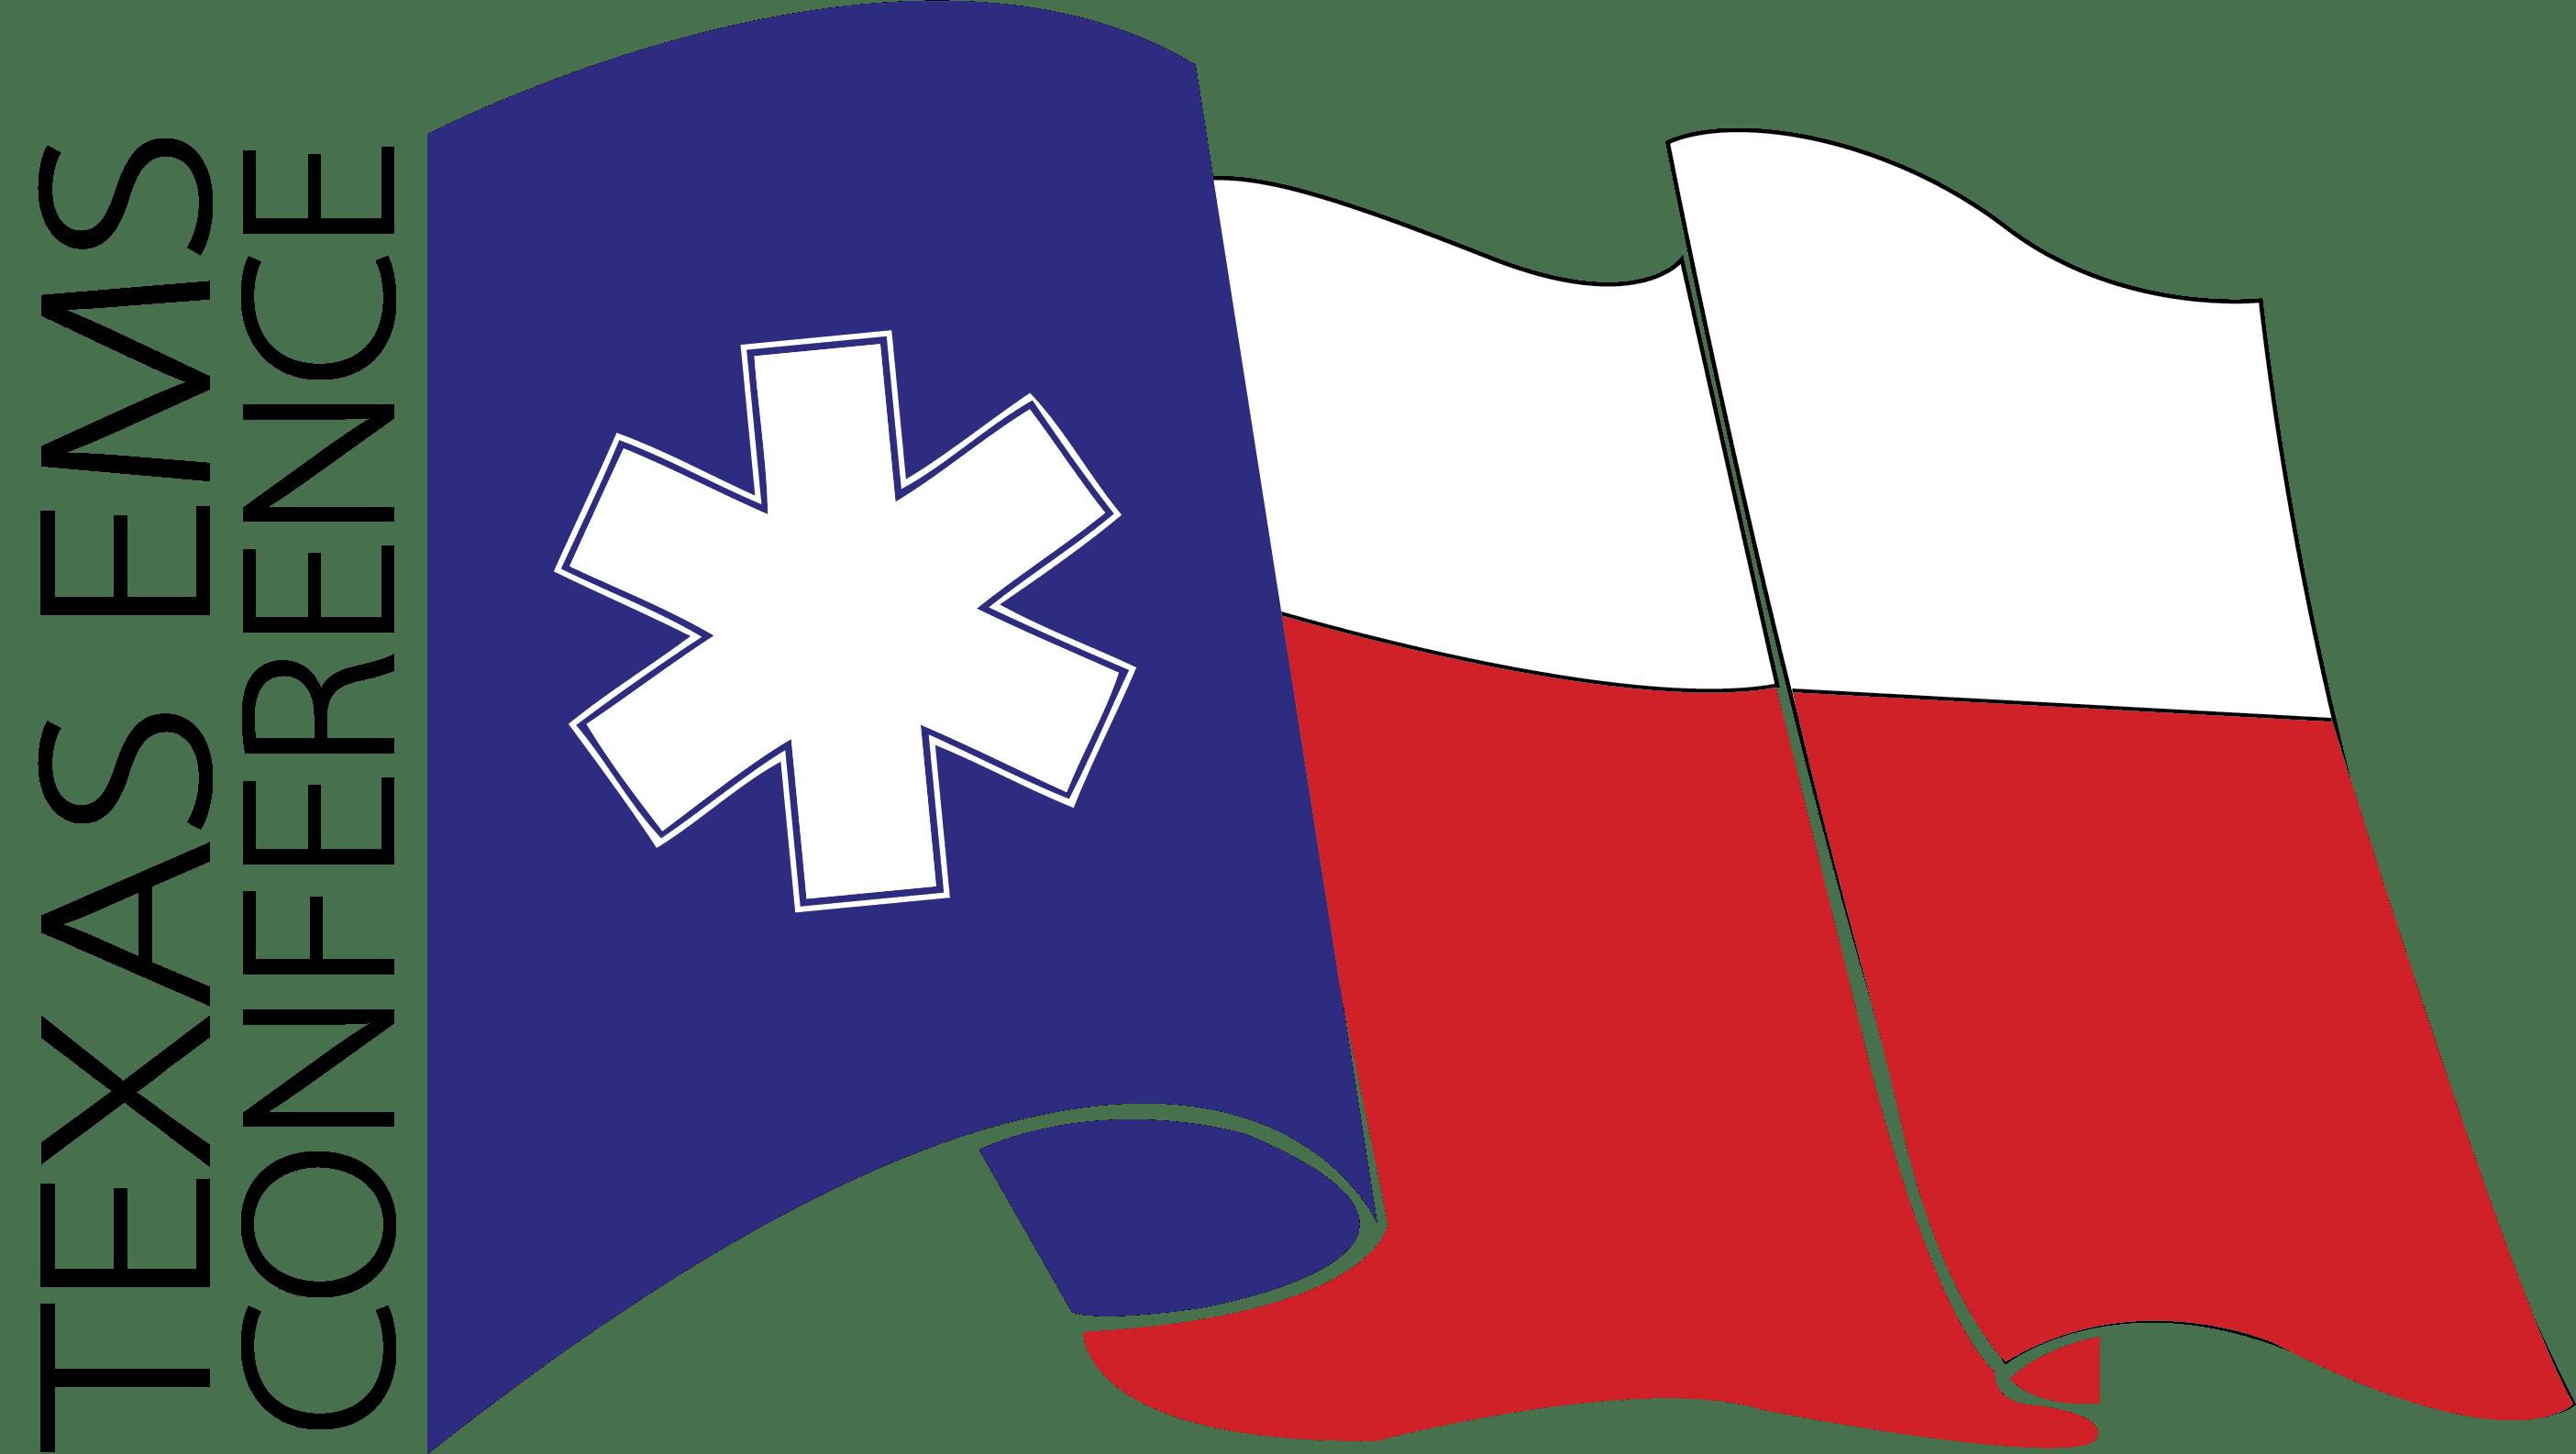 Texas EMS Conference Logo | Sladek Conference Services, Inc. | Lampasas, TX